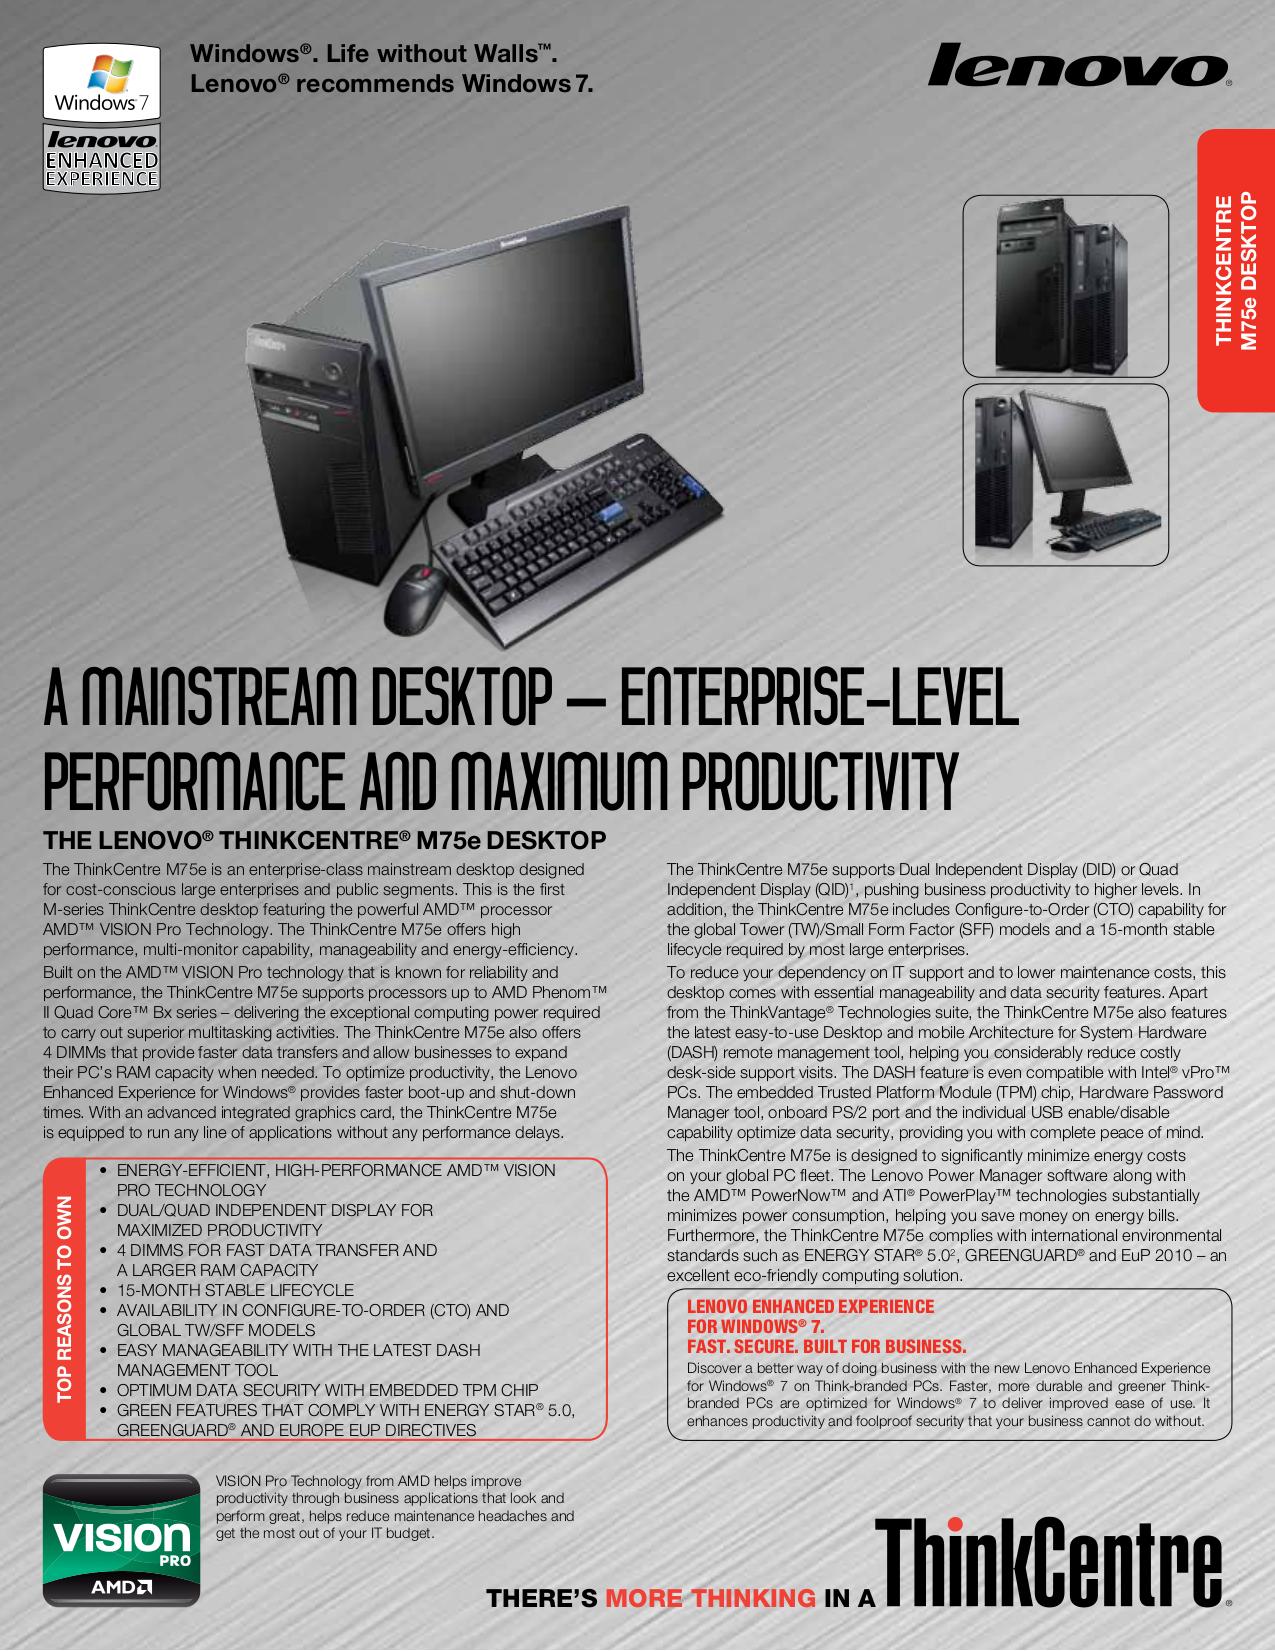 pdf for Lenovo Desktop ThinkCentre M75e 5062 manual